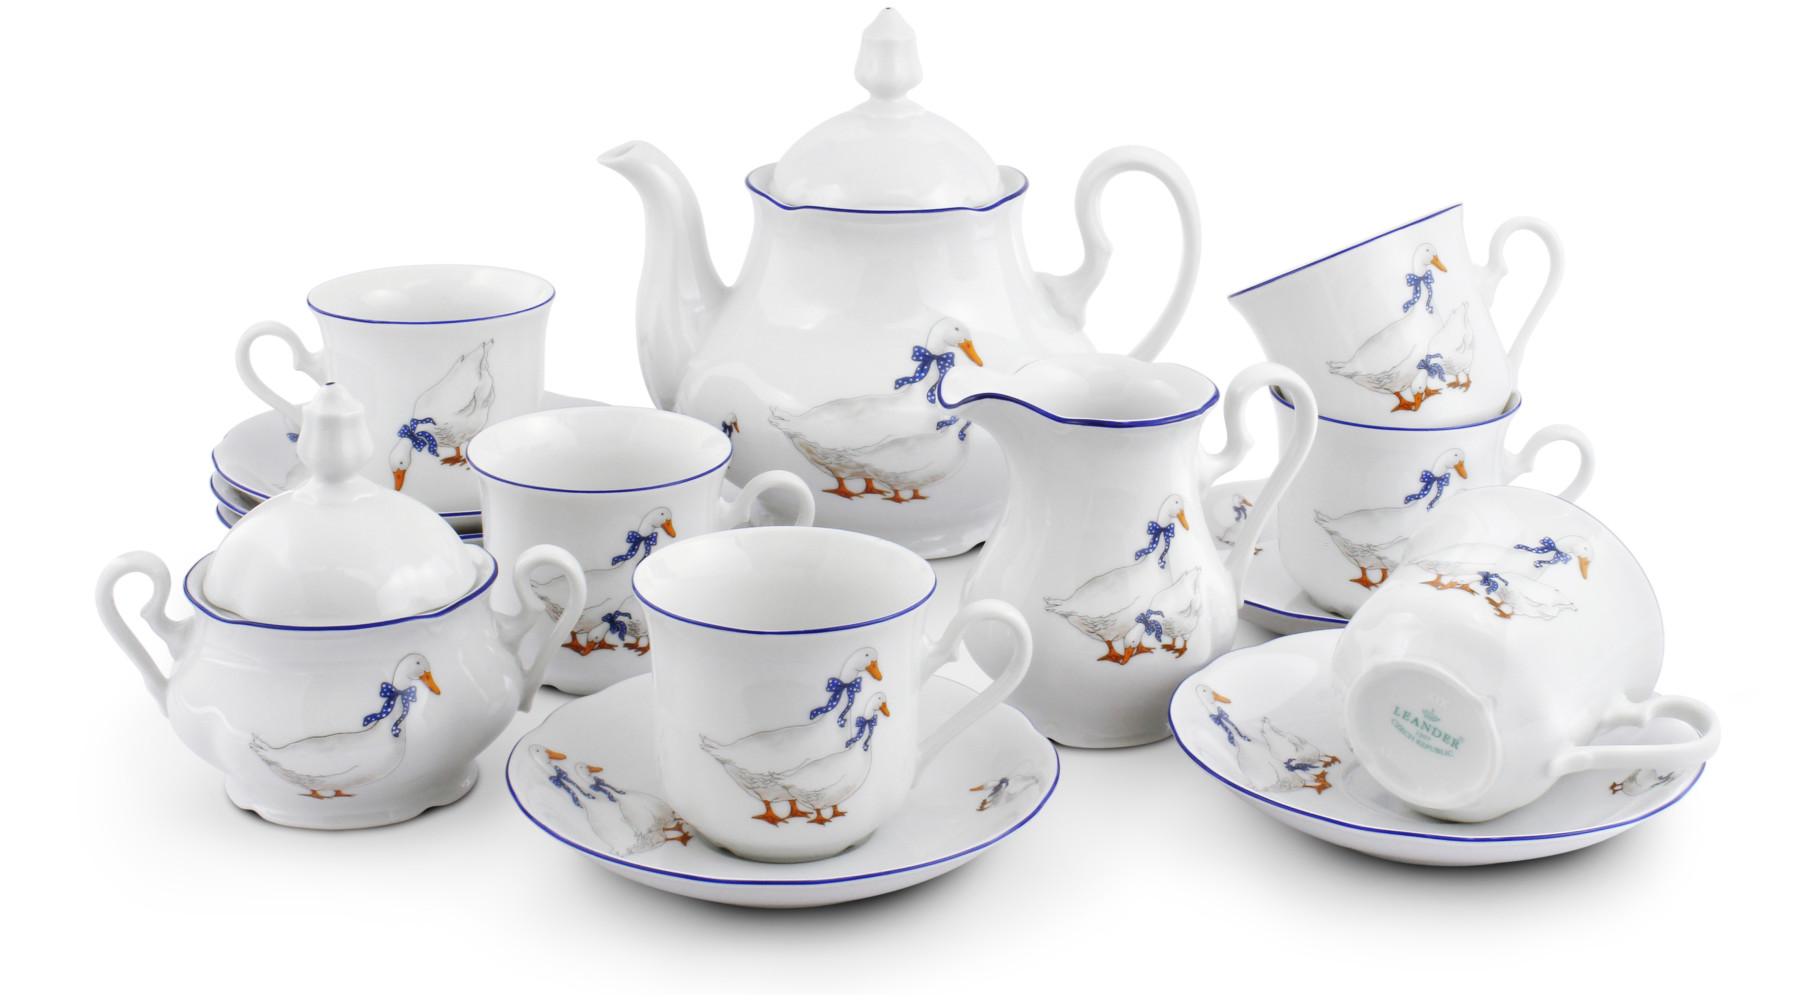 Tea set 15-piece - Geese